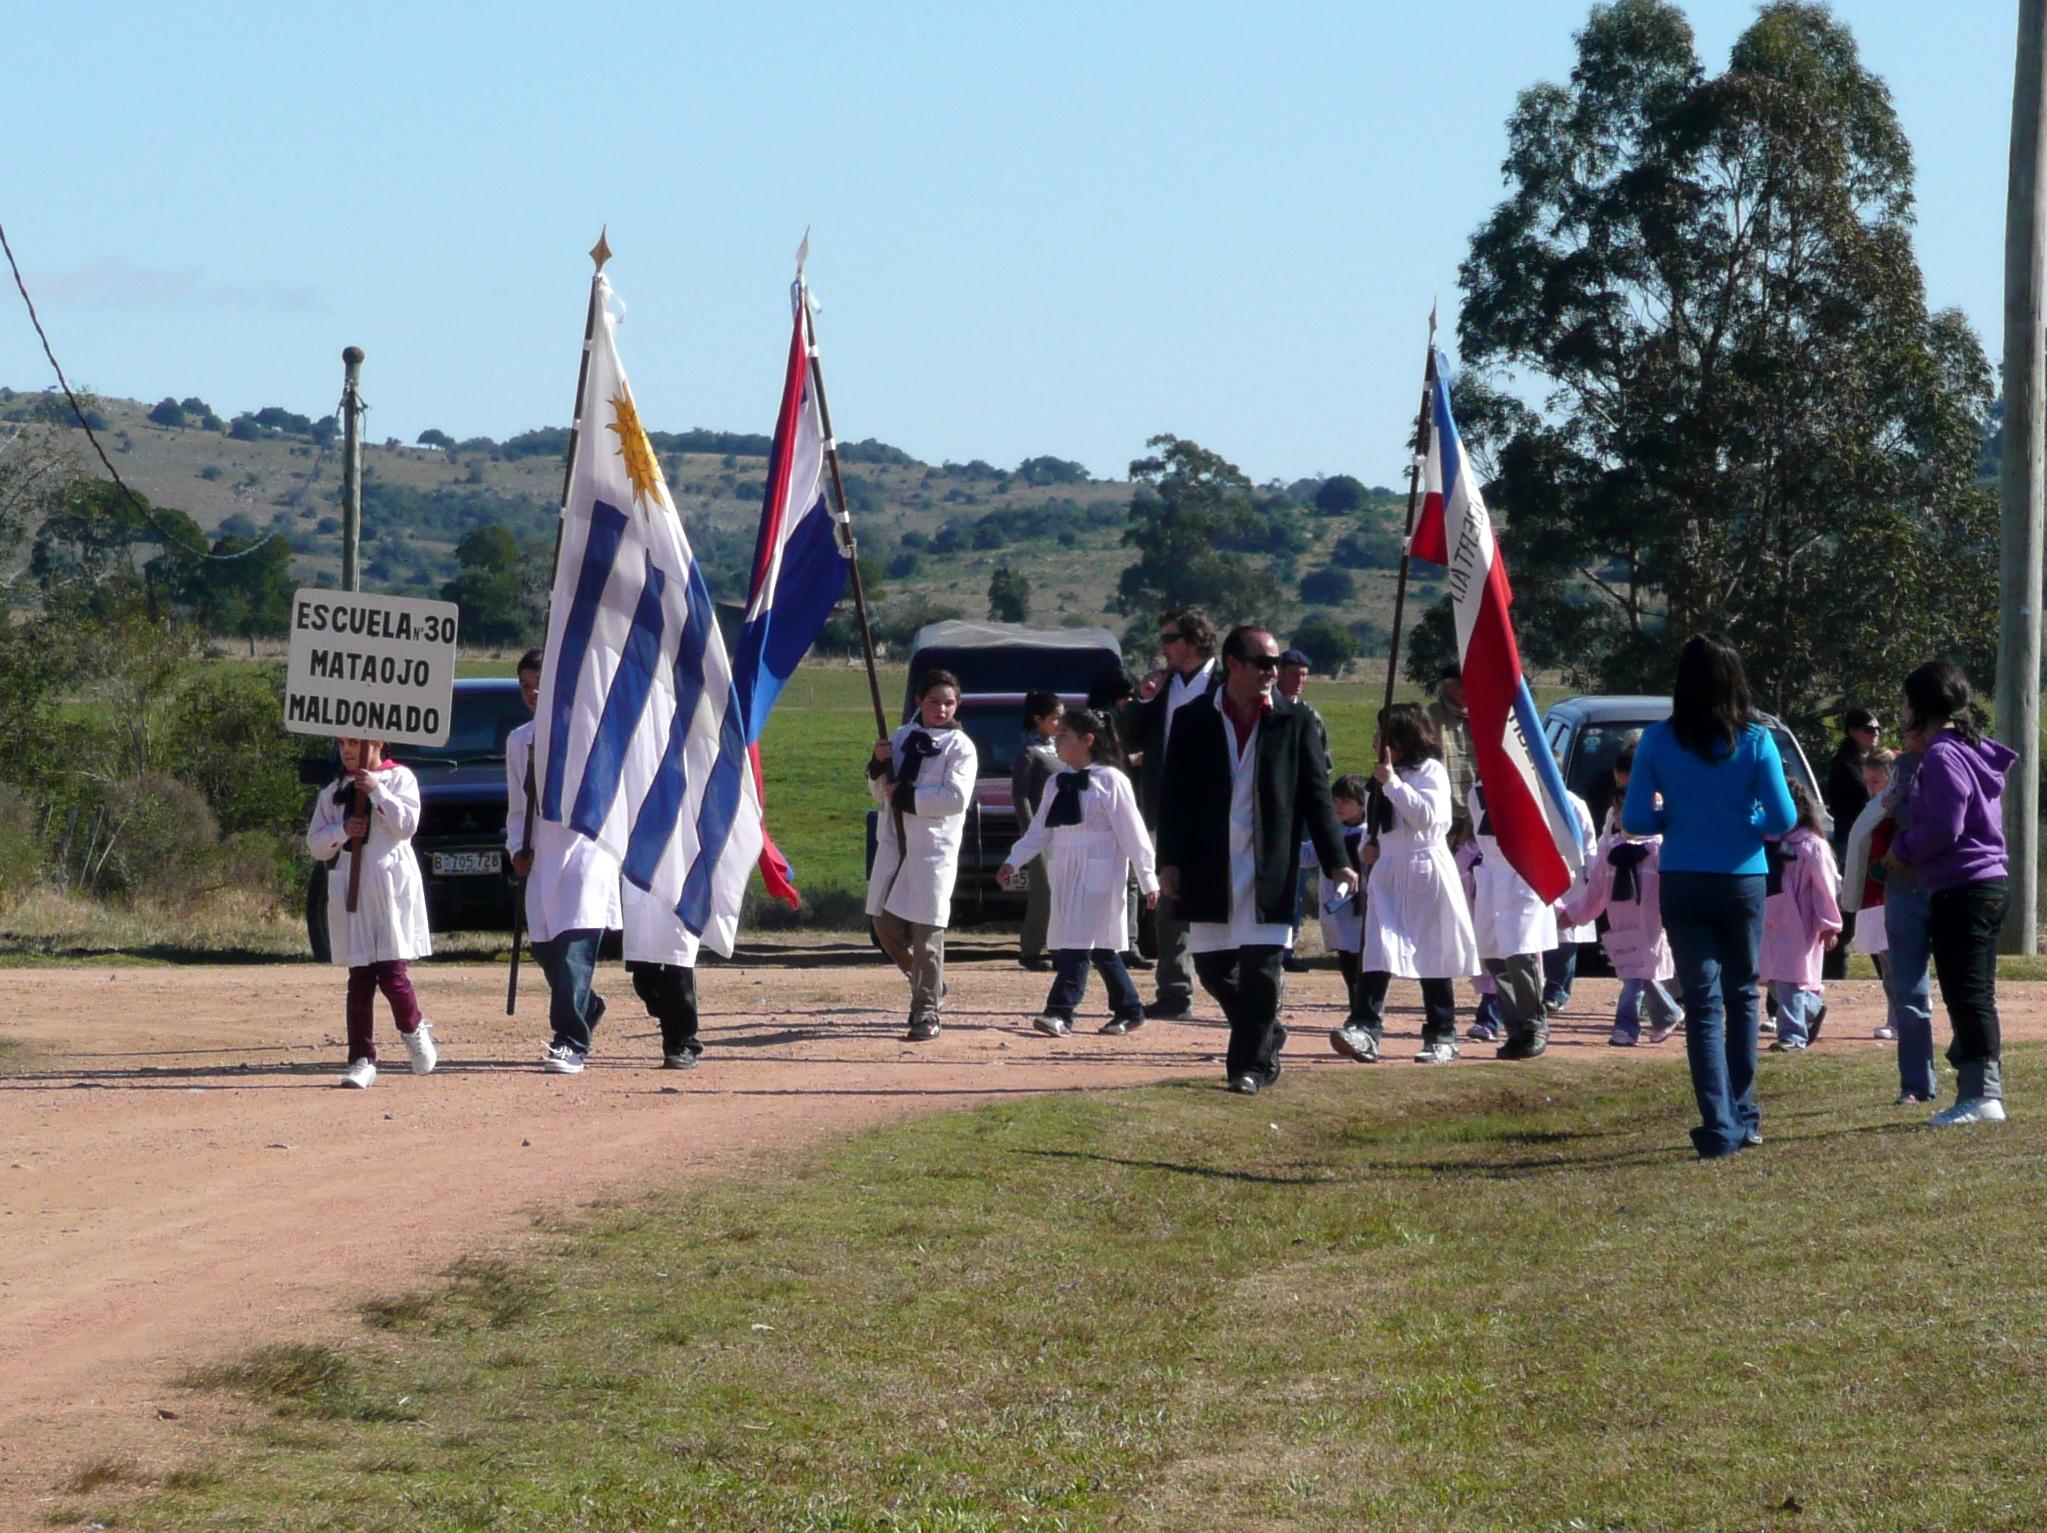 desfile alumnos escuela